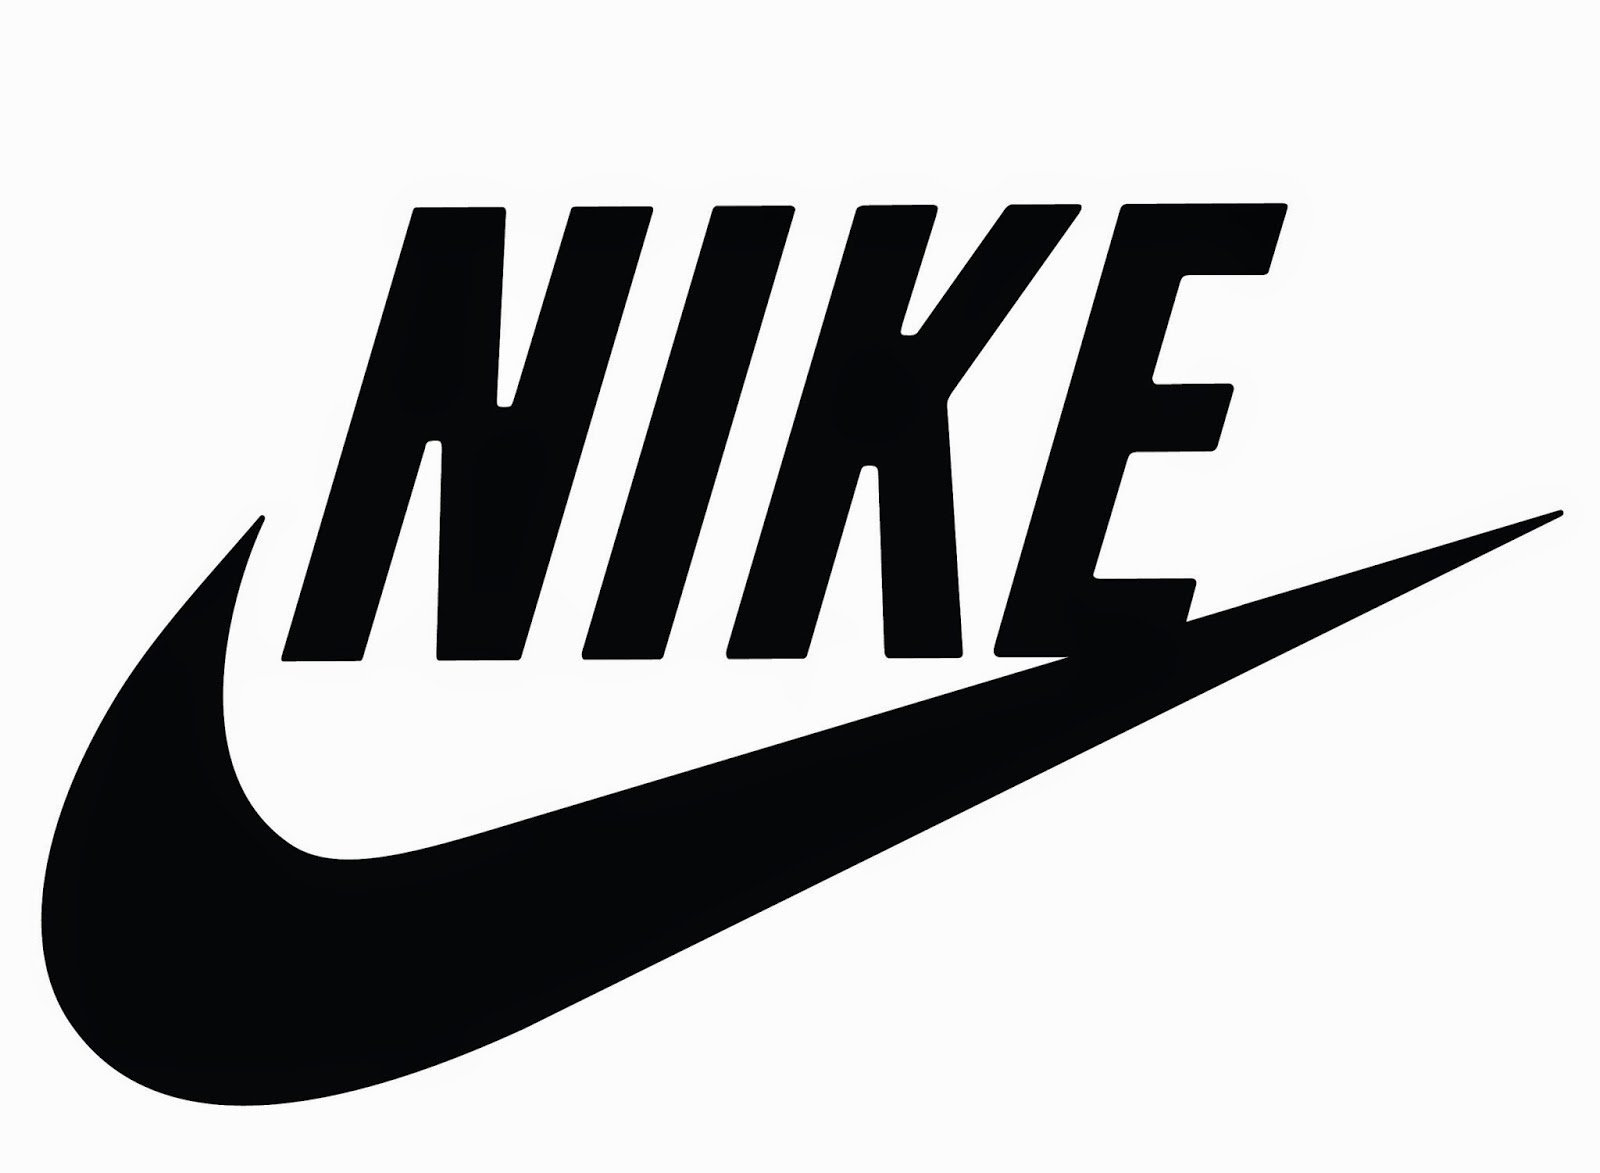 8 nike logo vector images red nike swoosh logo nike